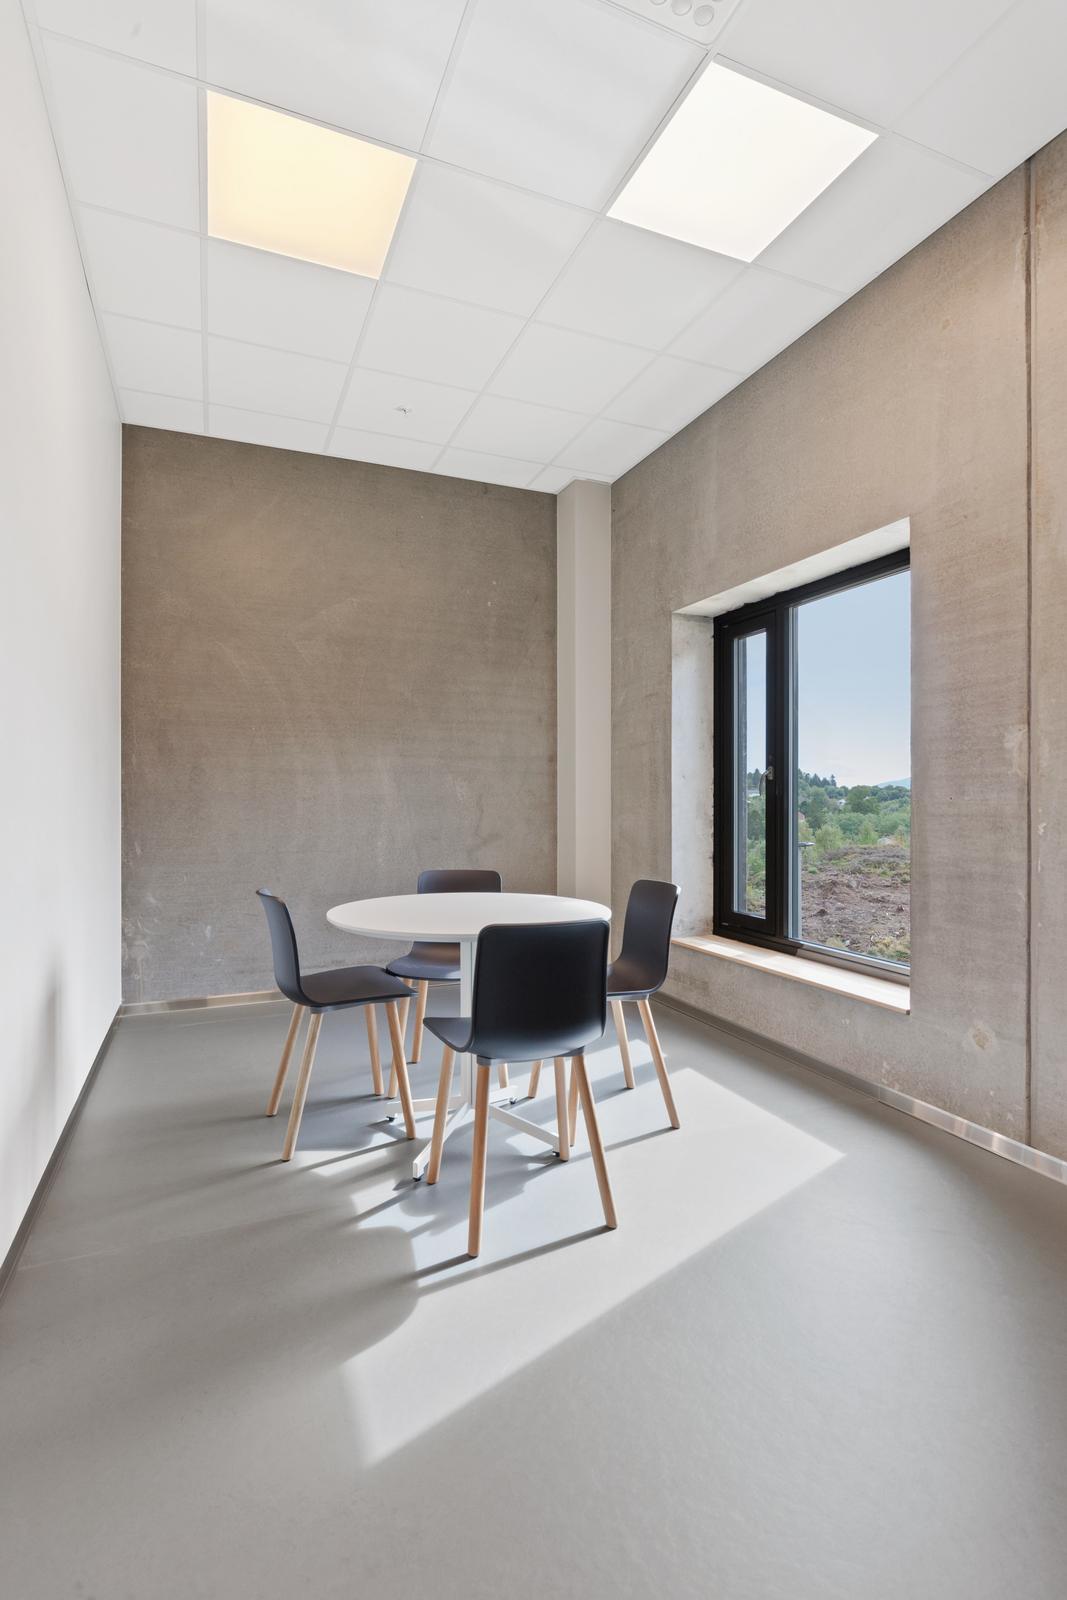 Belysning i møterom hos Helse Bergen Distriktspsykiatriske senter